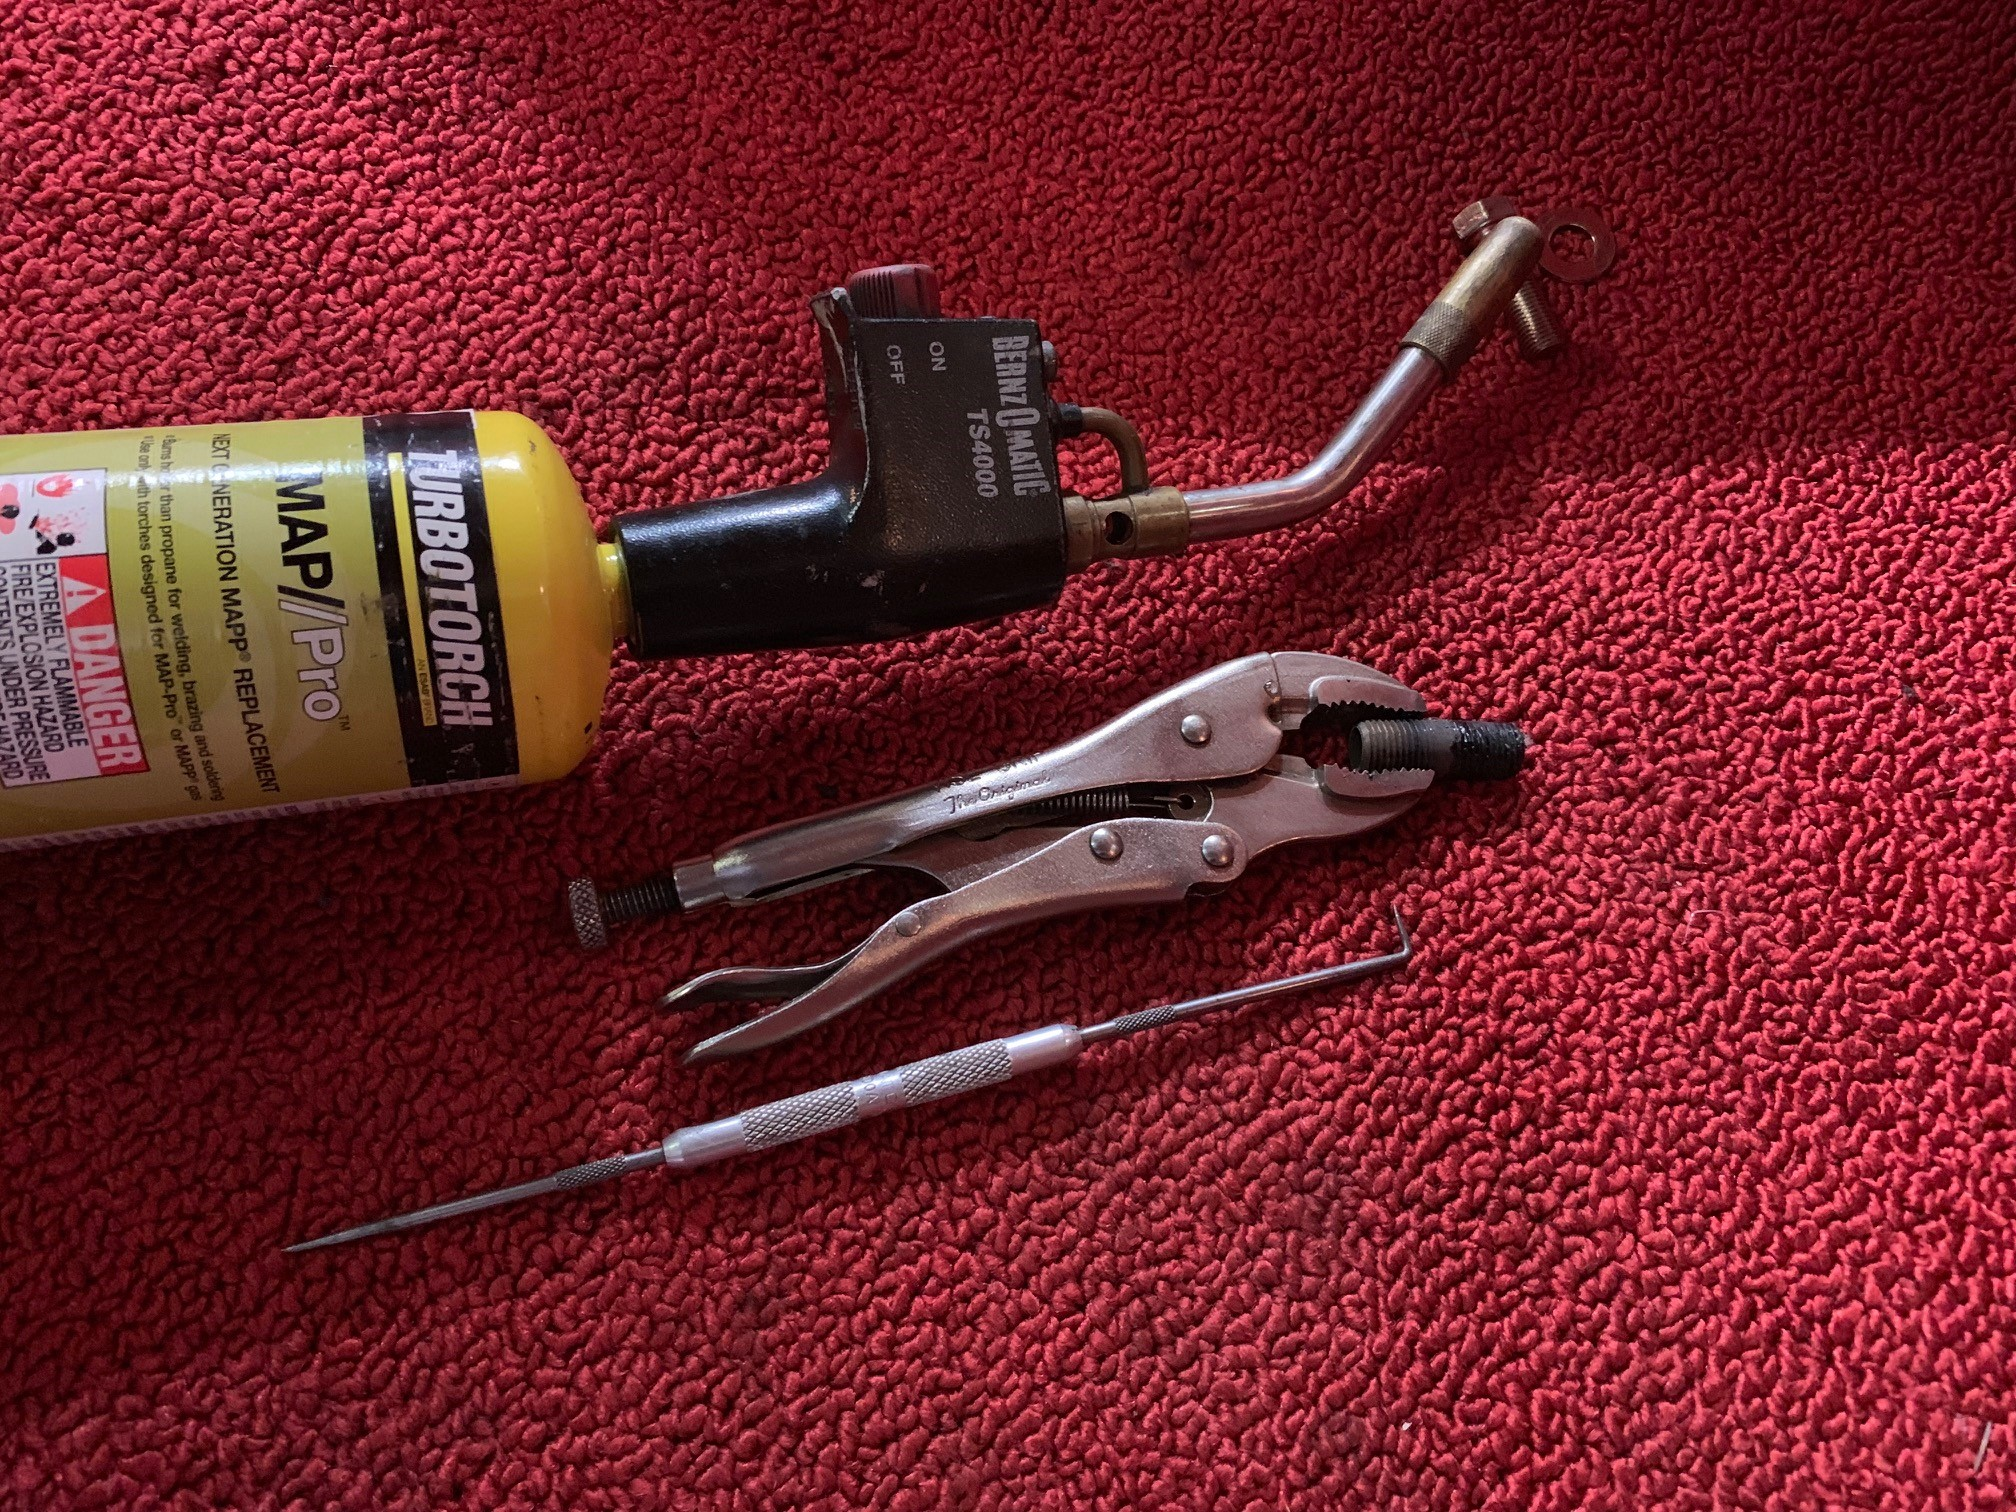 carpet tools.jpg